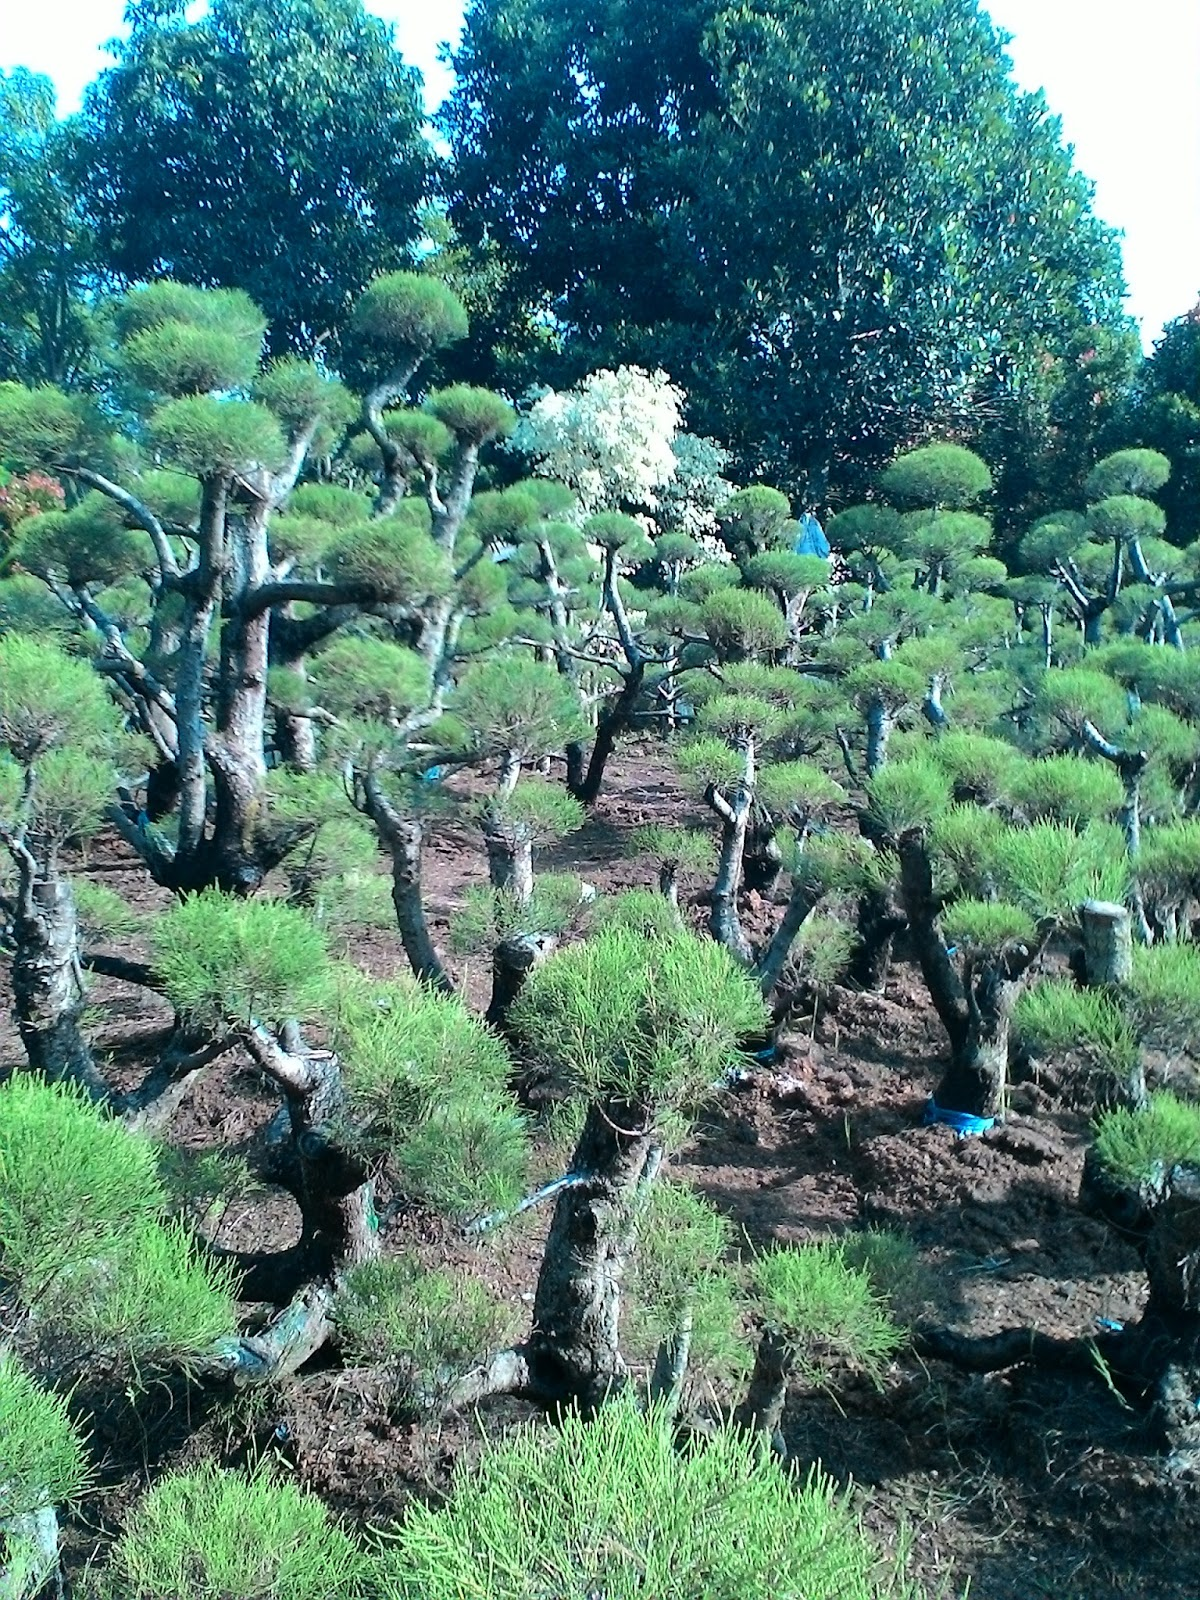 Pohon Cemara Udang Pohon Bonsai Cemara Udang Cemara Udang